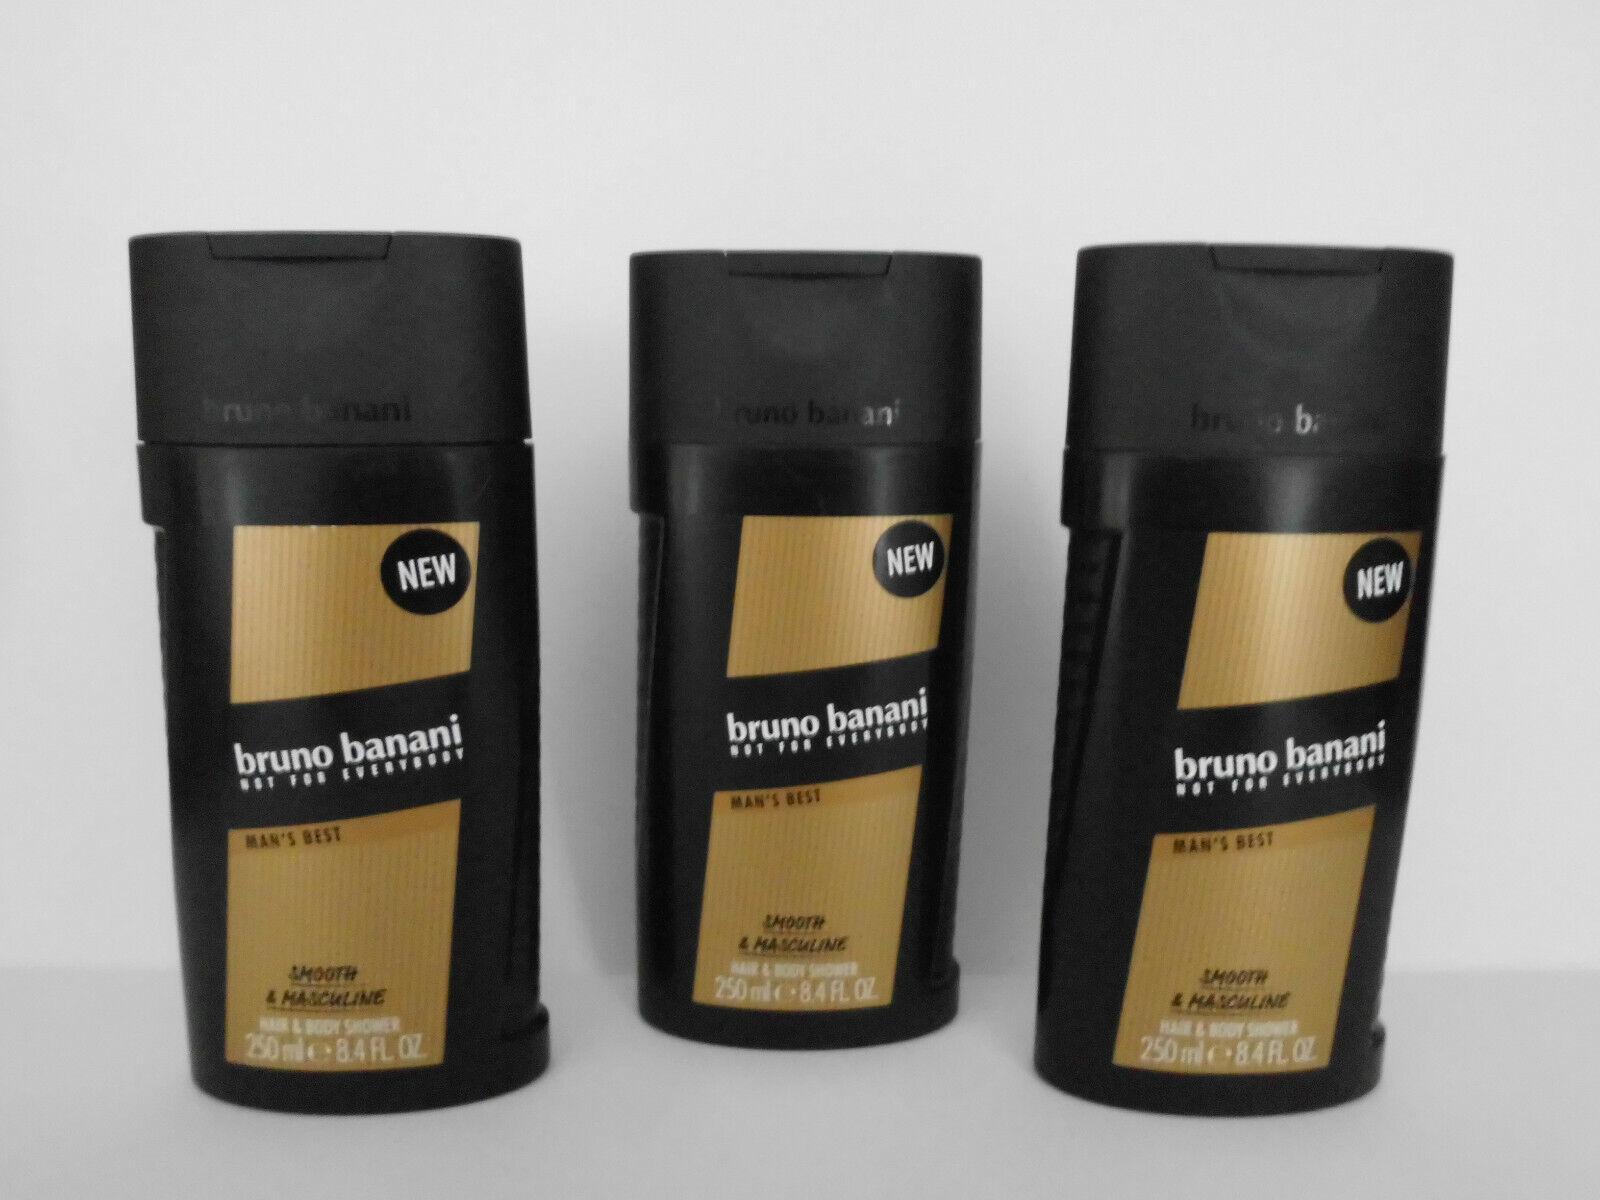 bruno banani MAN`S BEST Duschgel Hair & Body Shower  3 x 250 ml = 750 ml